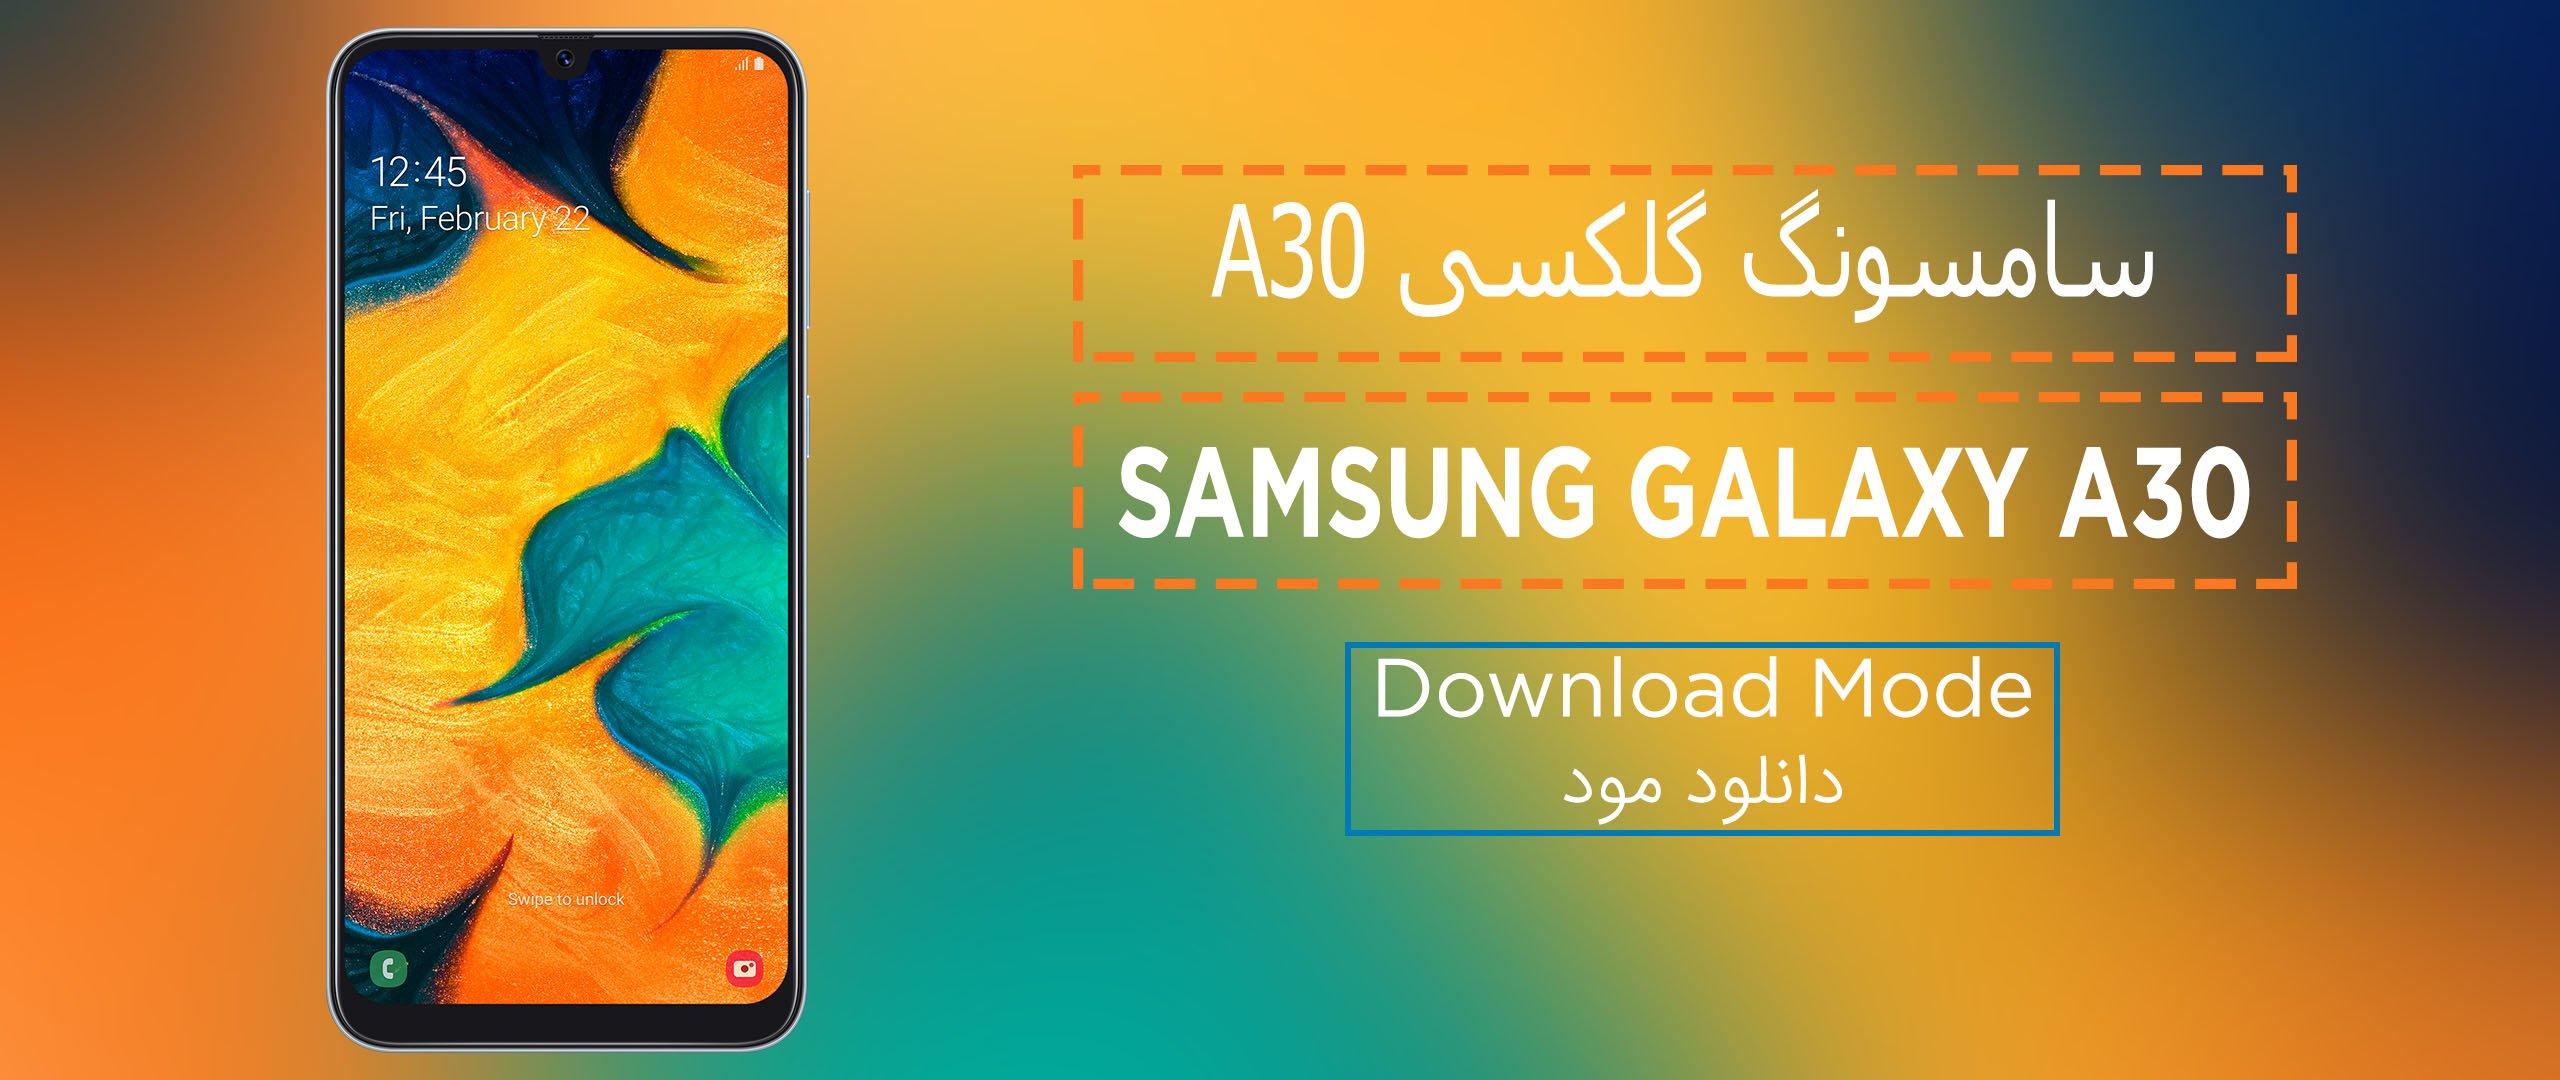 galaxy-a30-wallpaper-droidviews-01